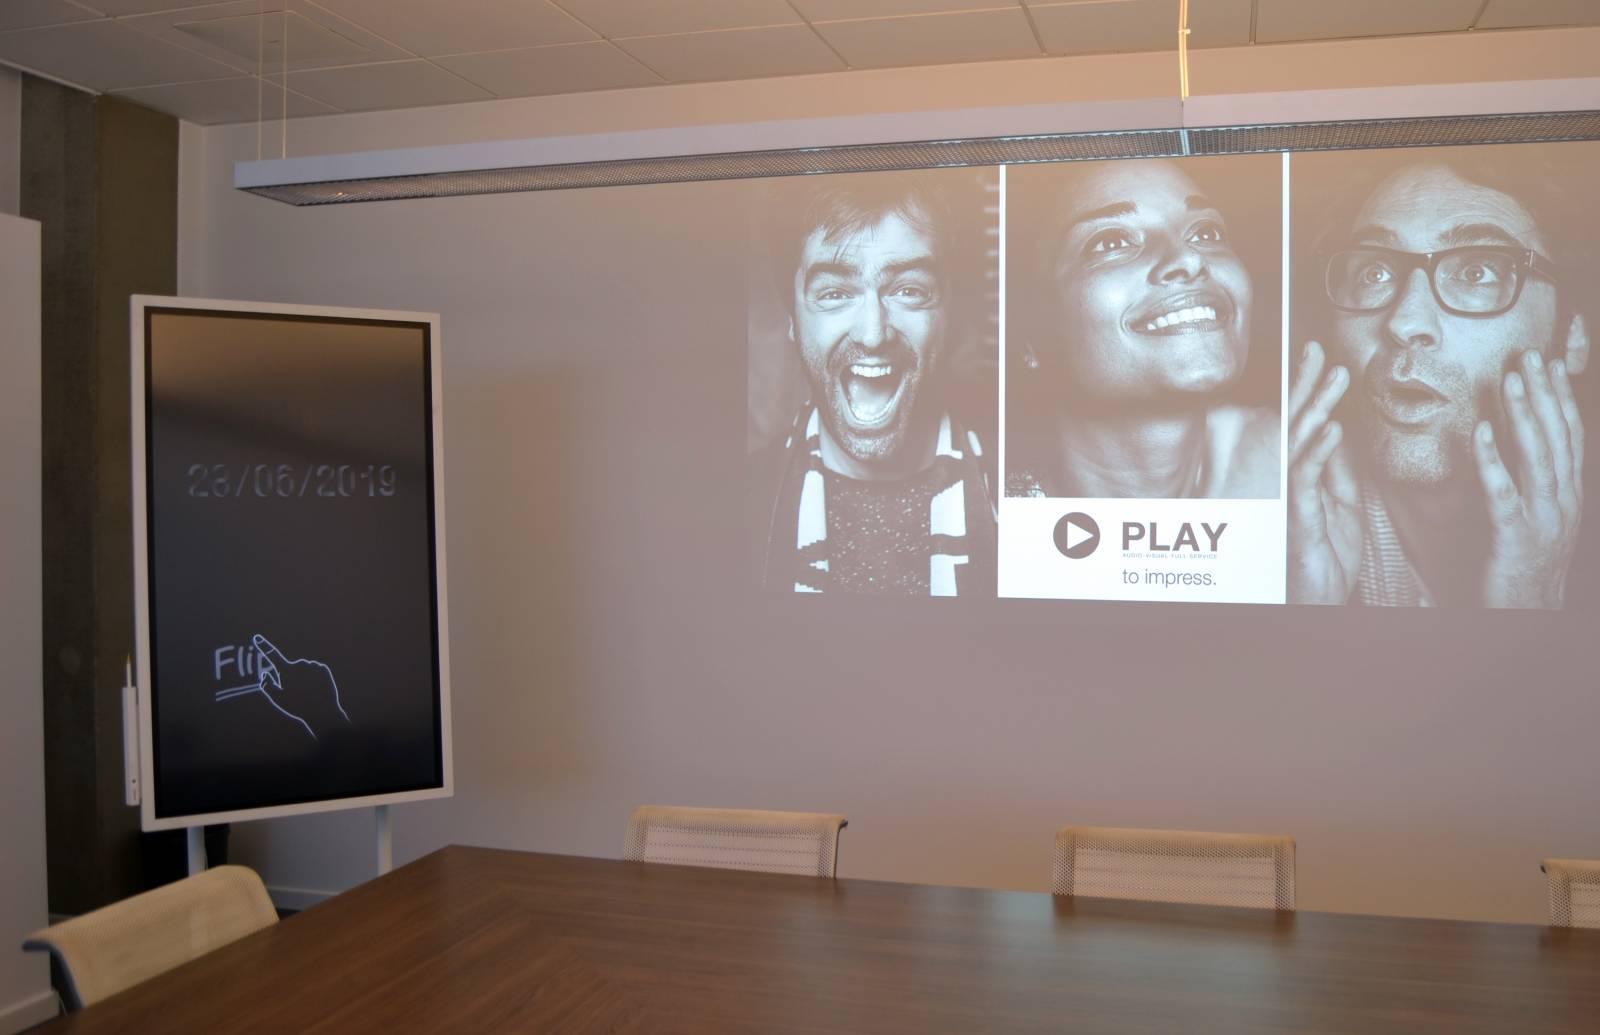 HQ Play AV - House of Events - 2